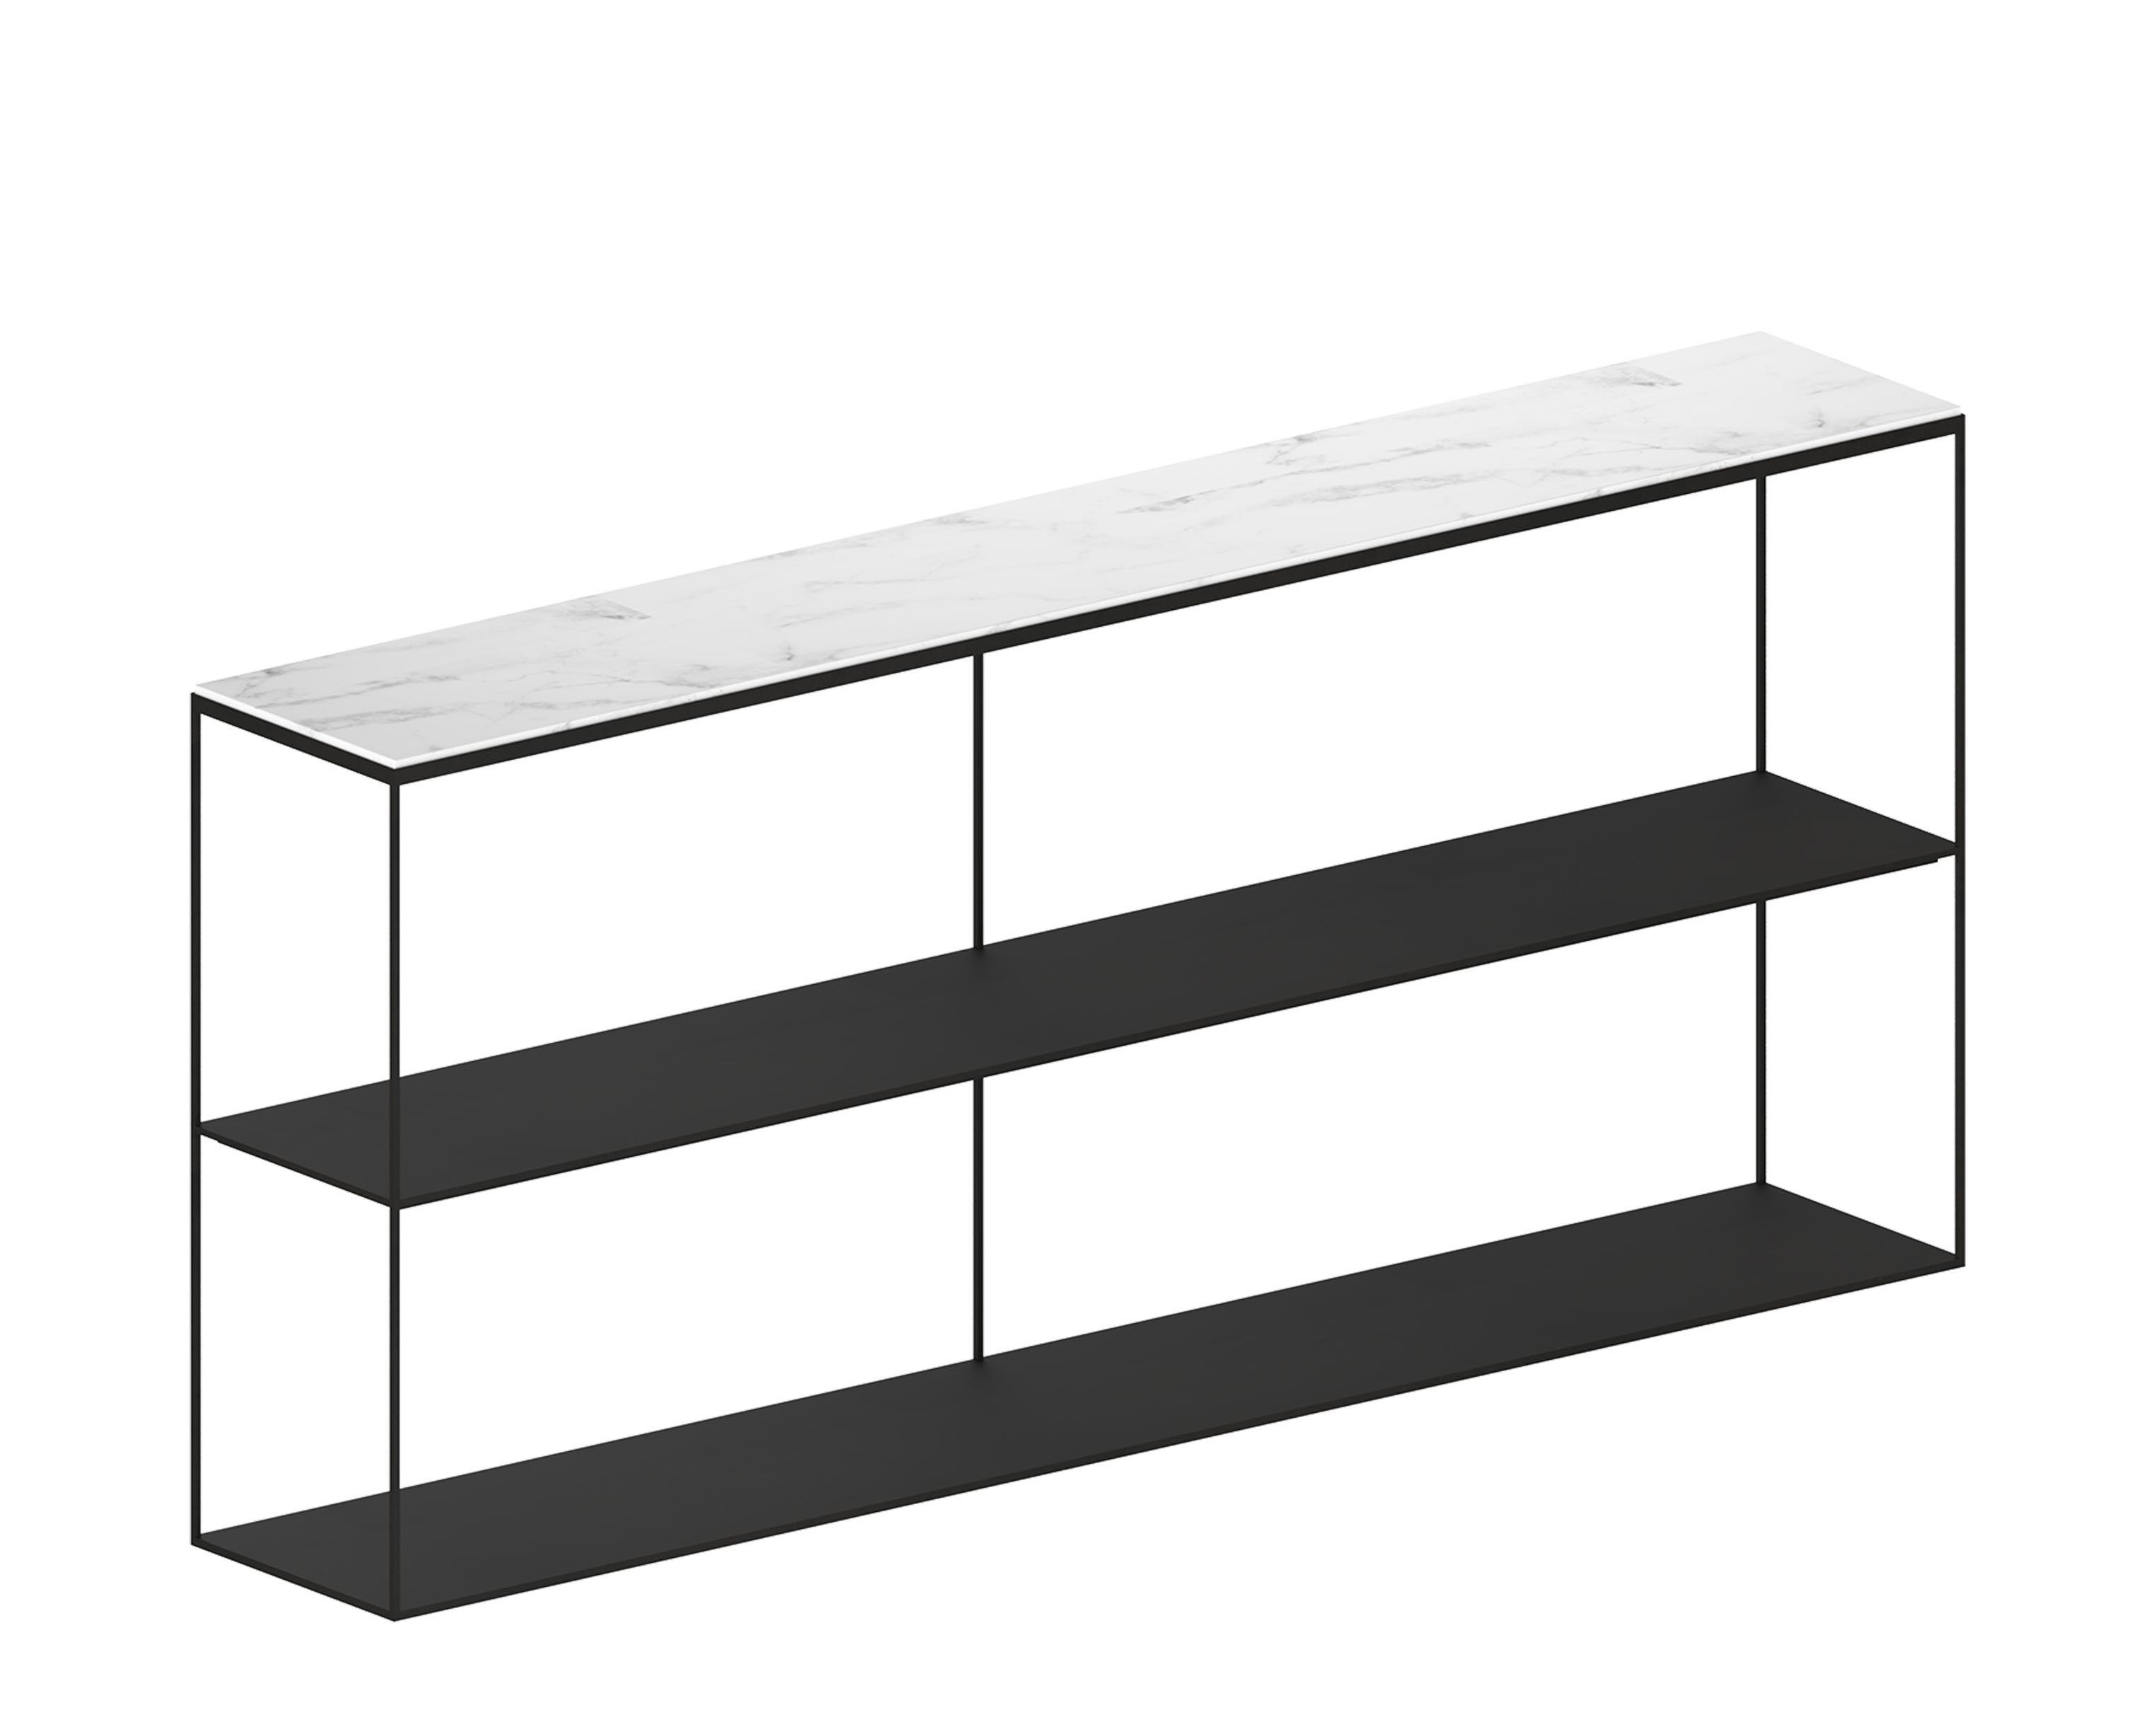 Furniture - Bookcases & Bookshelves - Slim Marbre Shelf - / L 180 x H 83 cm by Zeus - Copper black / White marble - Carrare marble, Epoxy painted steel